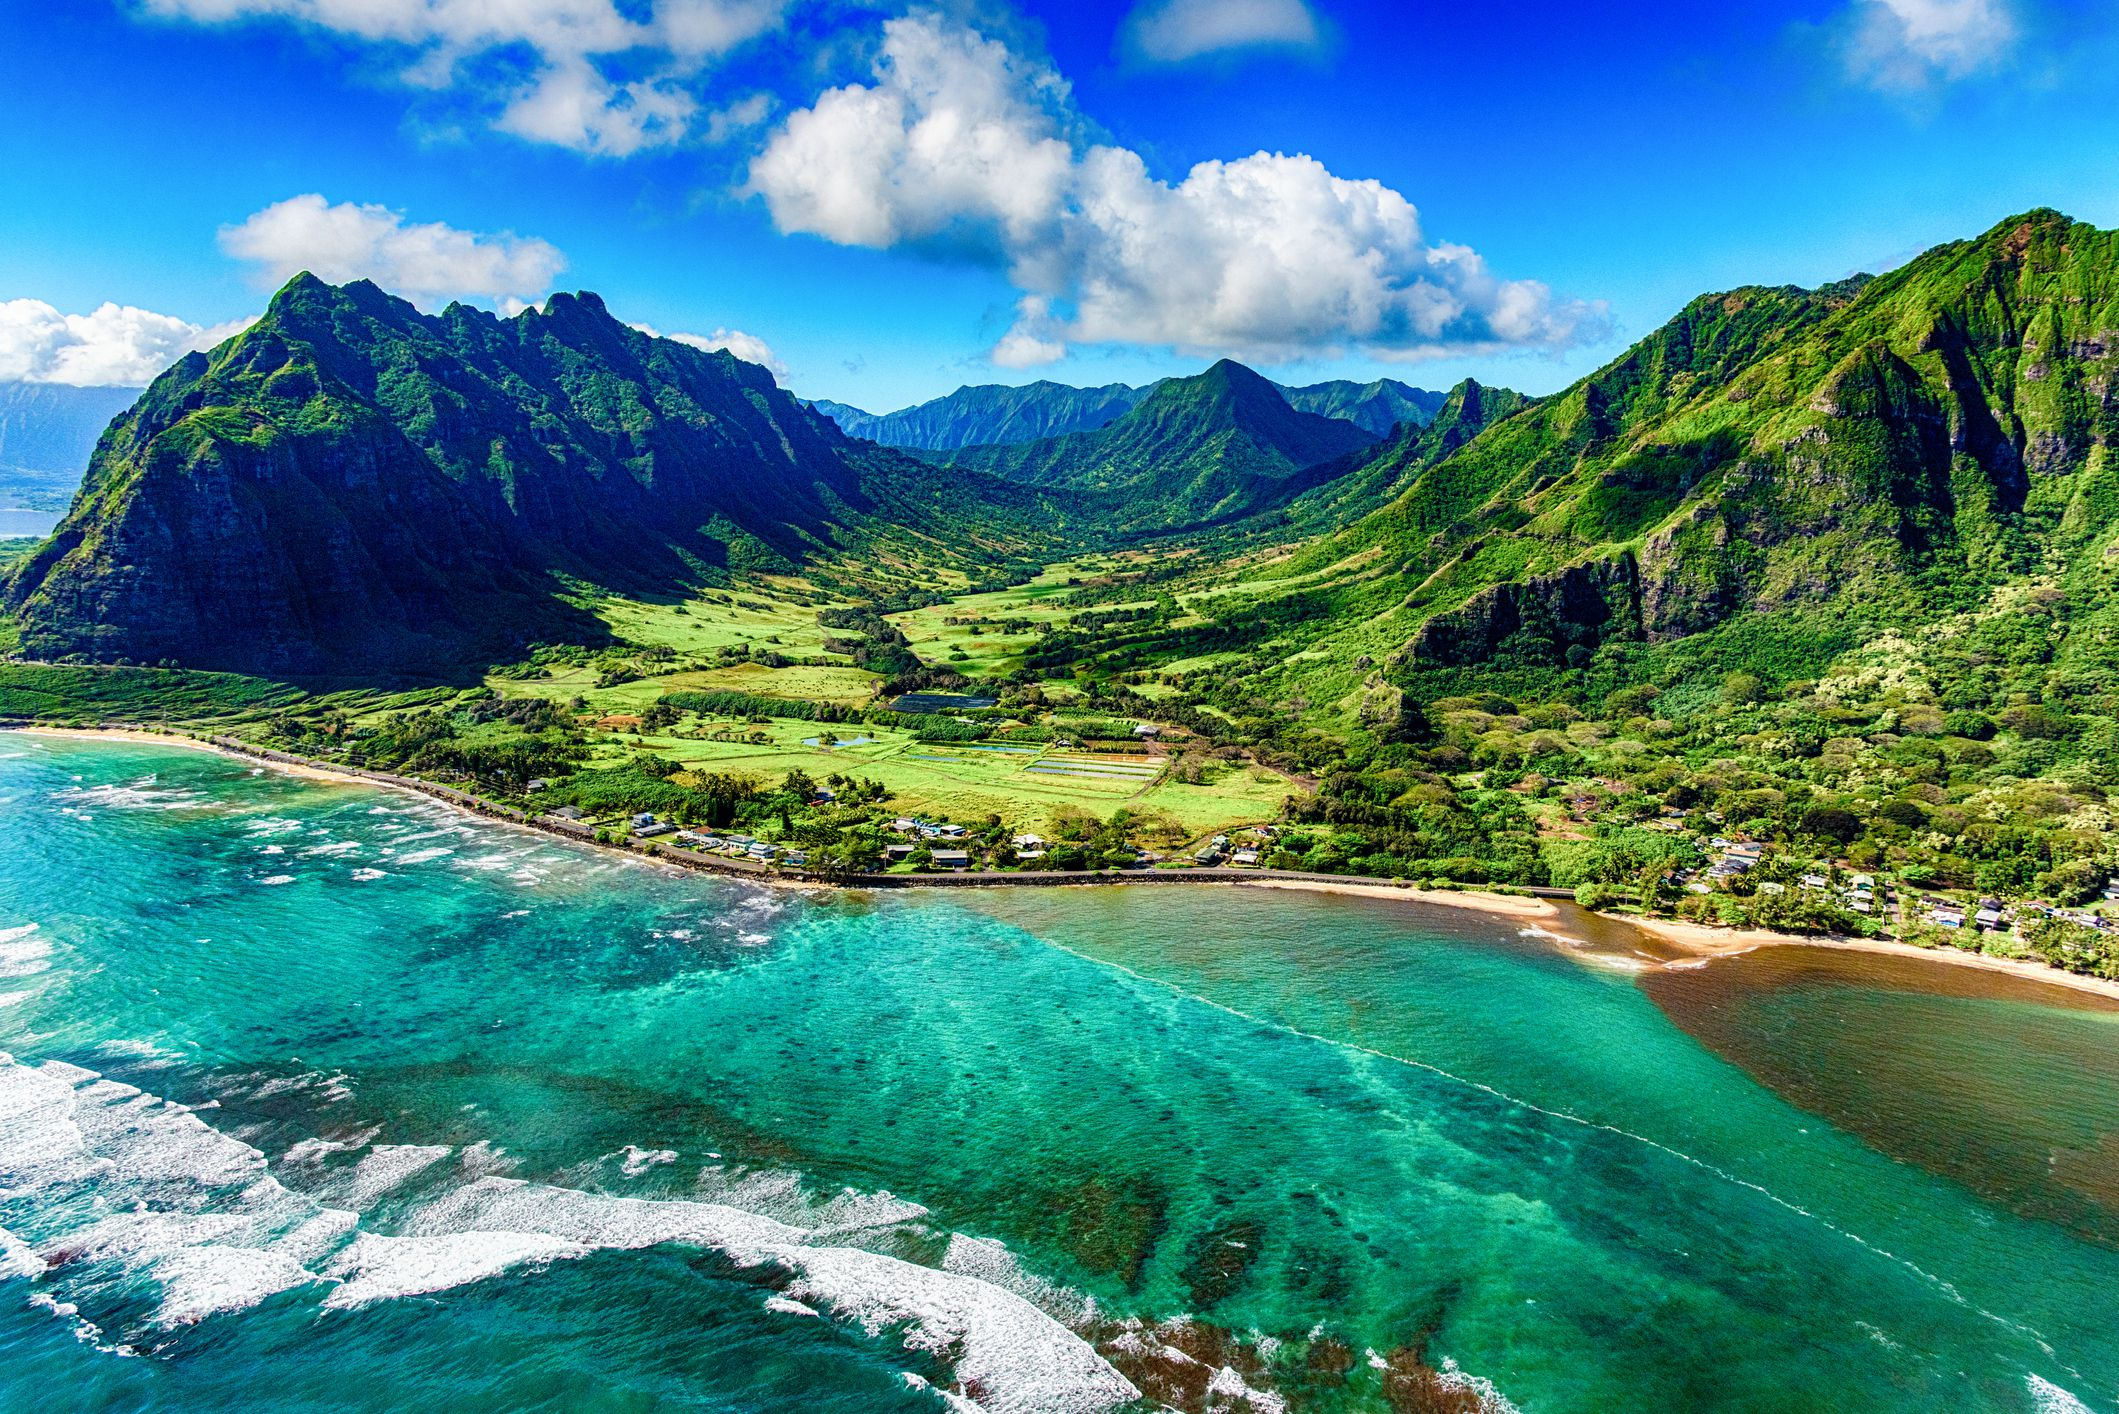 aerial-view-of-kualoa-area-of-oahu-hawaii-938335974-5c0ac2b846e0fb0001aa630e.jpg